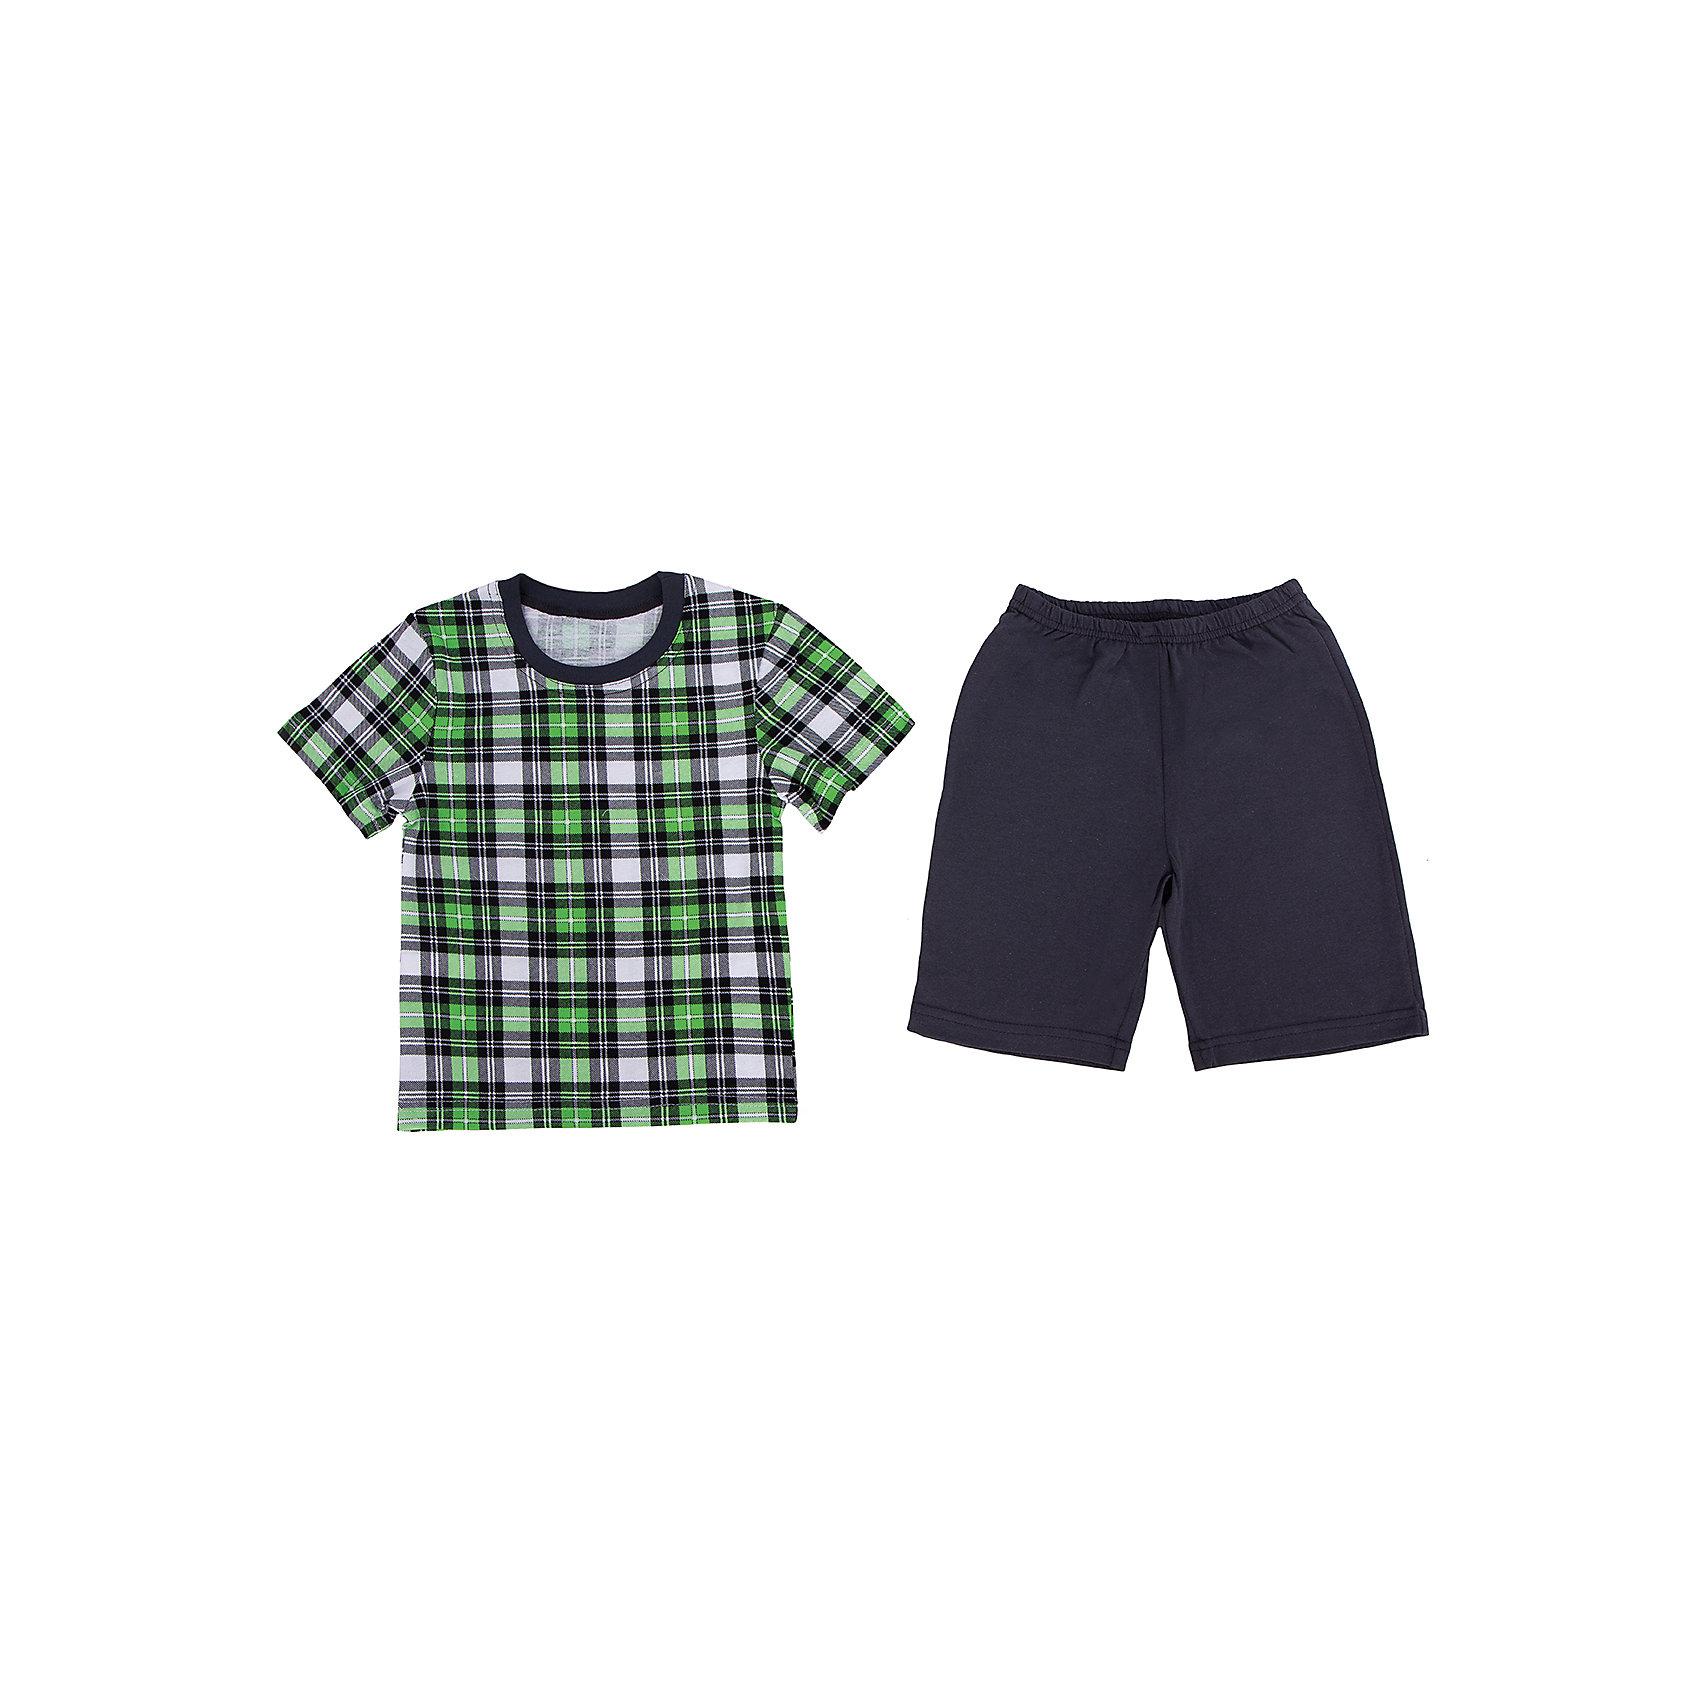 Пижама для мальчика АпрельПижама для мальчика от известного бренда Апрель. <br><br>Состав:<br>хлопок 100%<br><br>Ширина мм: 281<br>Глубина мм: 70<br>Высота мм: 188<br>Вес г: 295<br>Цвет: зеленый<br>Возраст от месяцев: 12<br>Возраст до месяцев: 18<br>Пол: Мужской<br>Возраст: Детский<br>Размер: 86,116,110,104,92<br>SKU: 4768085